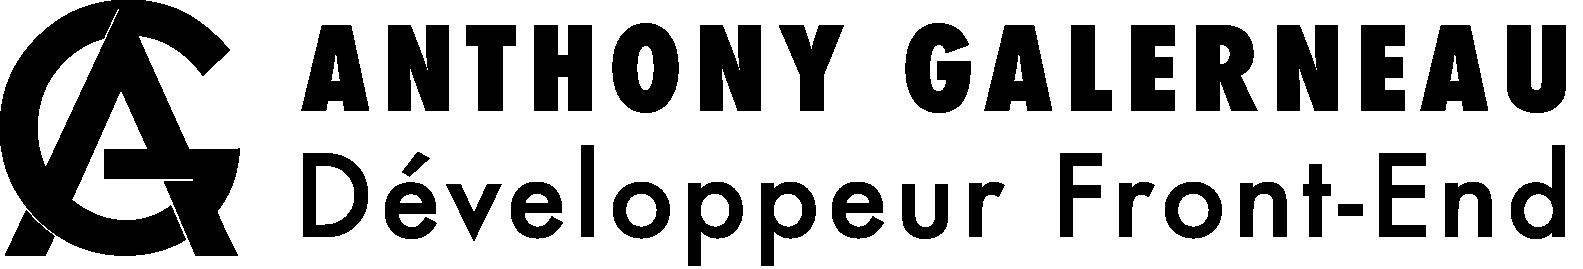 ANTHONY GALERNEAU